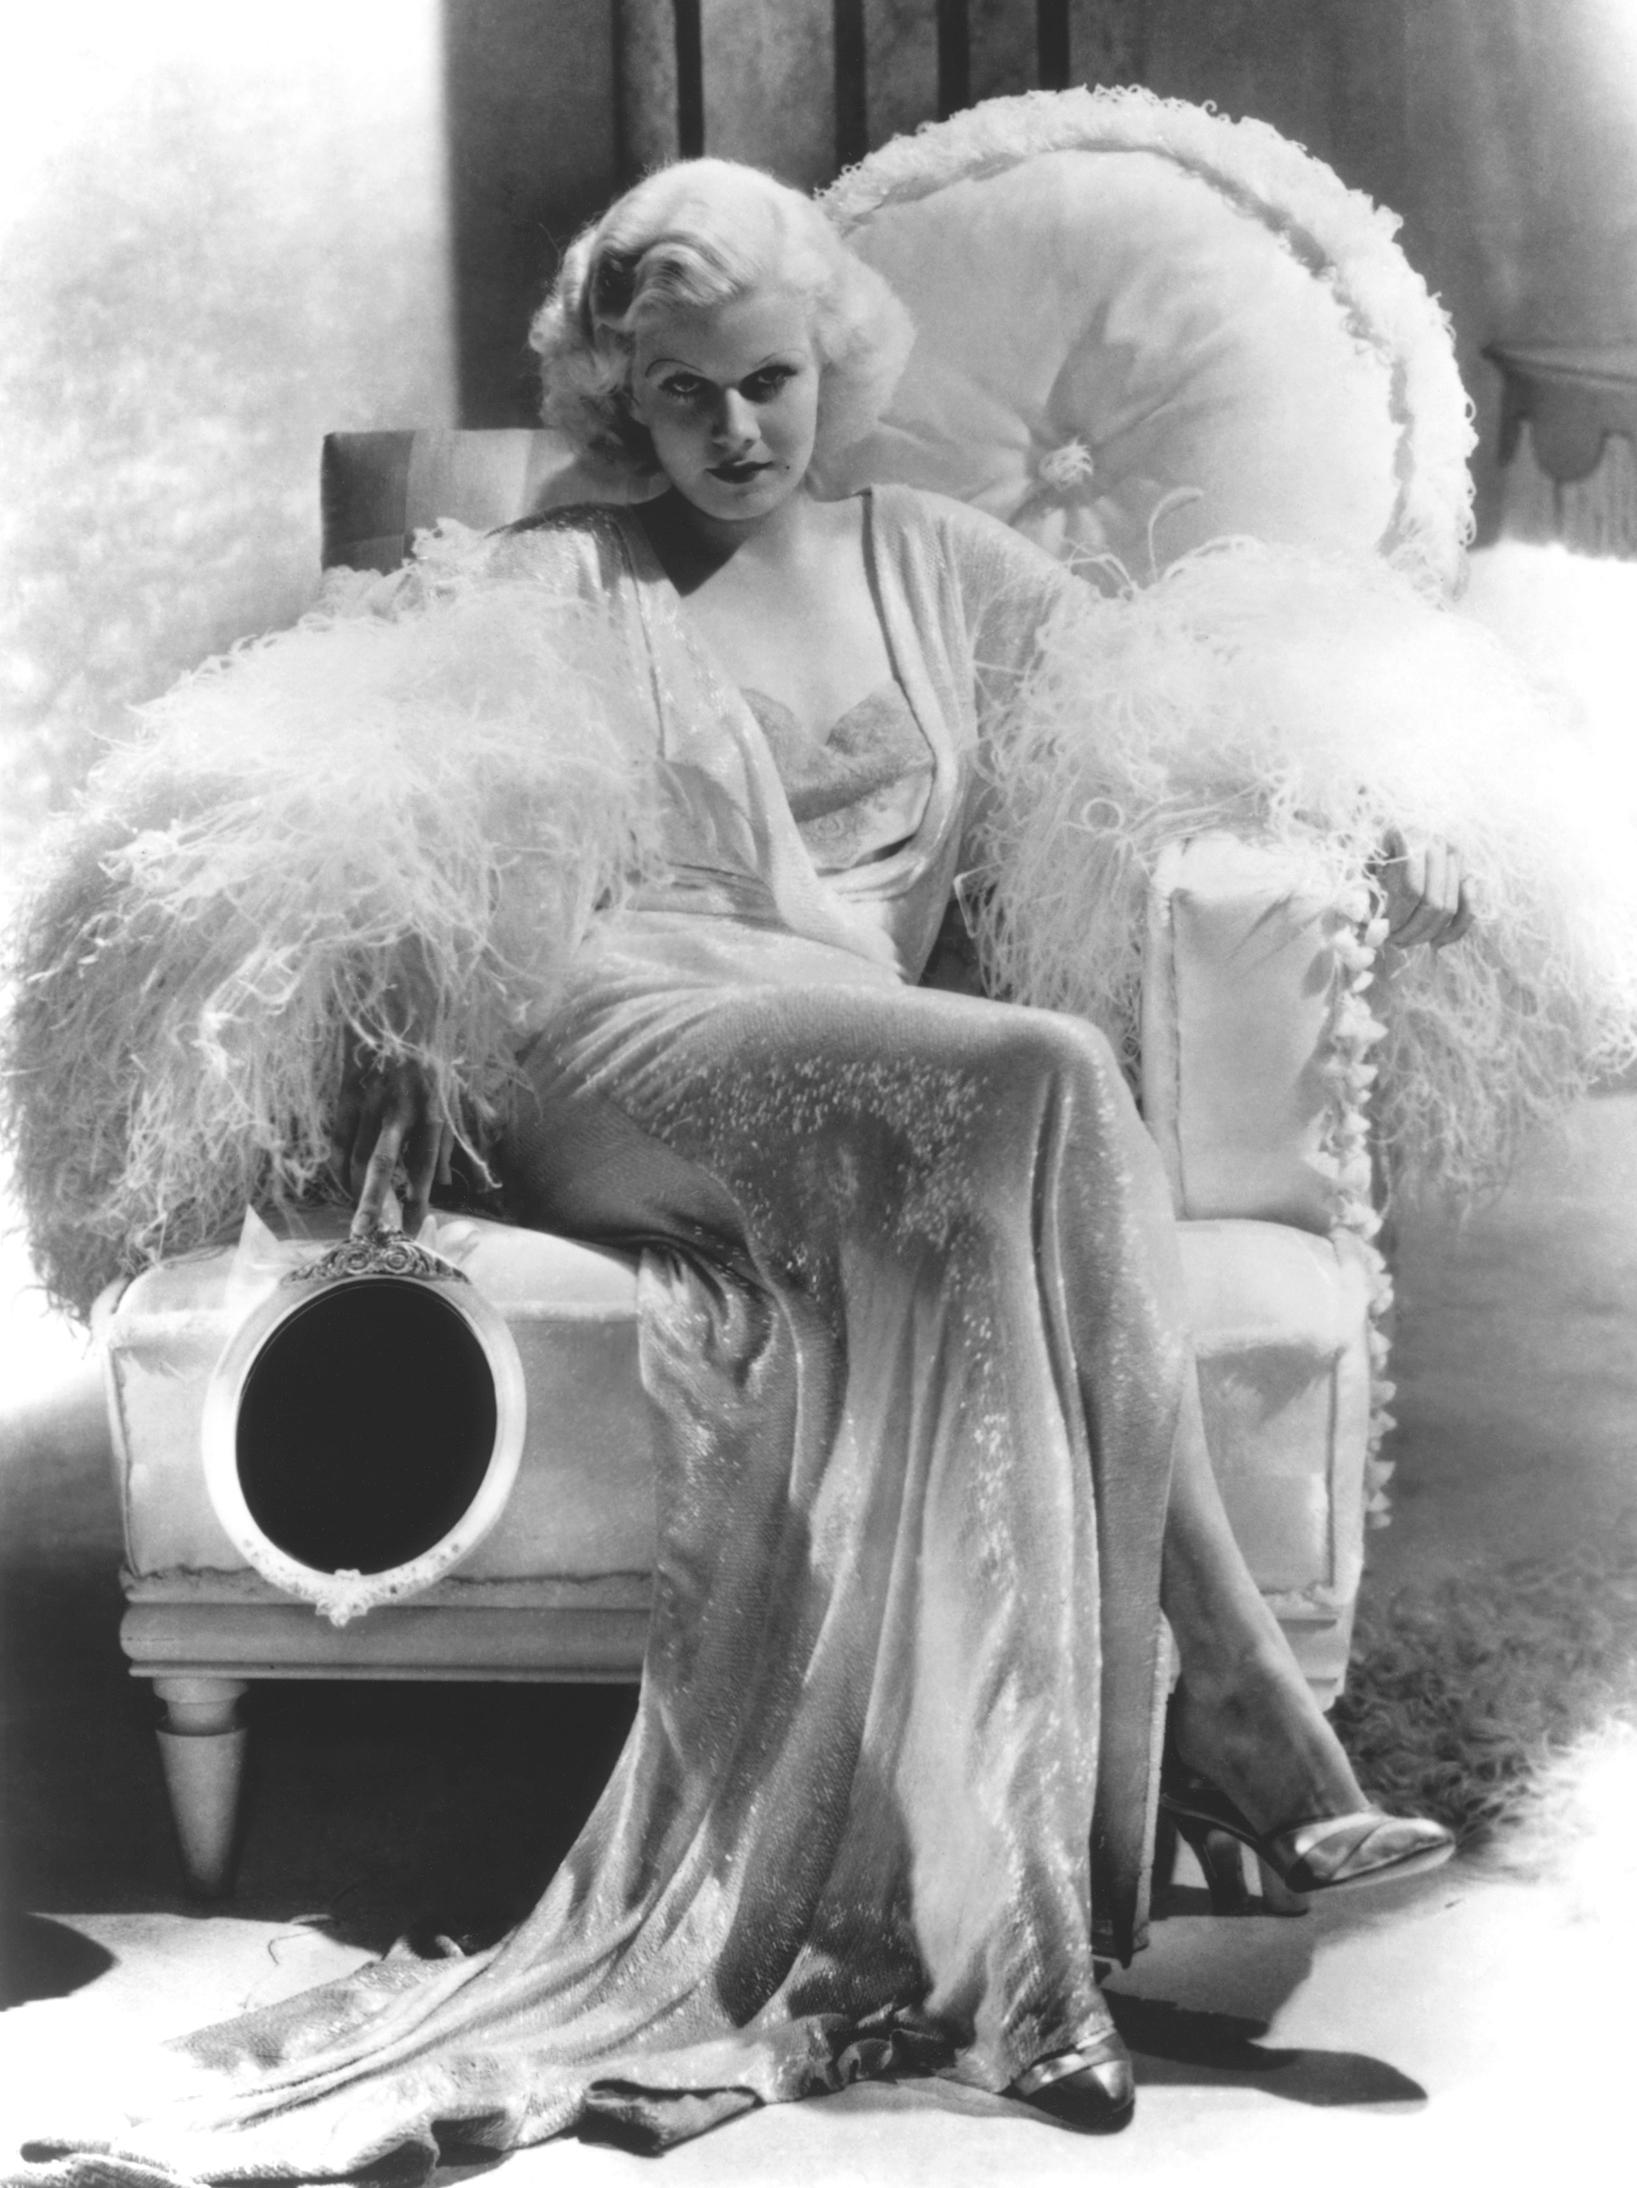 Marilyn Monroe a la Jean Harlow - Marilyn modeled her image after Jean Harlow, her idol.